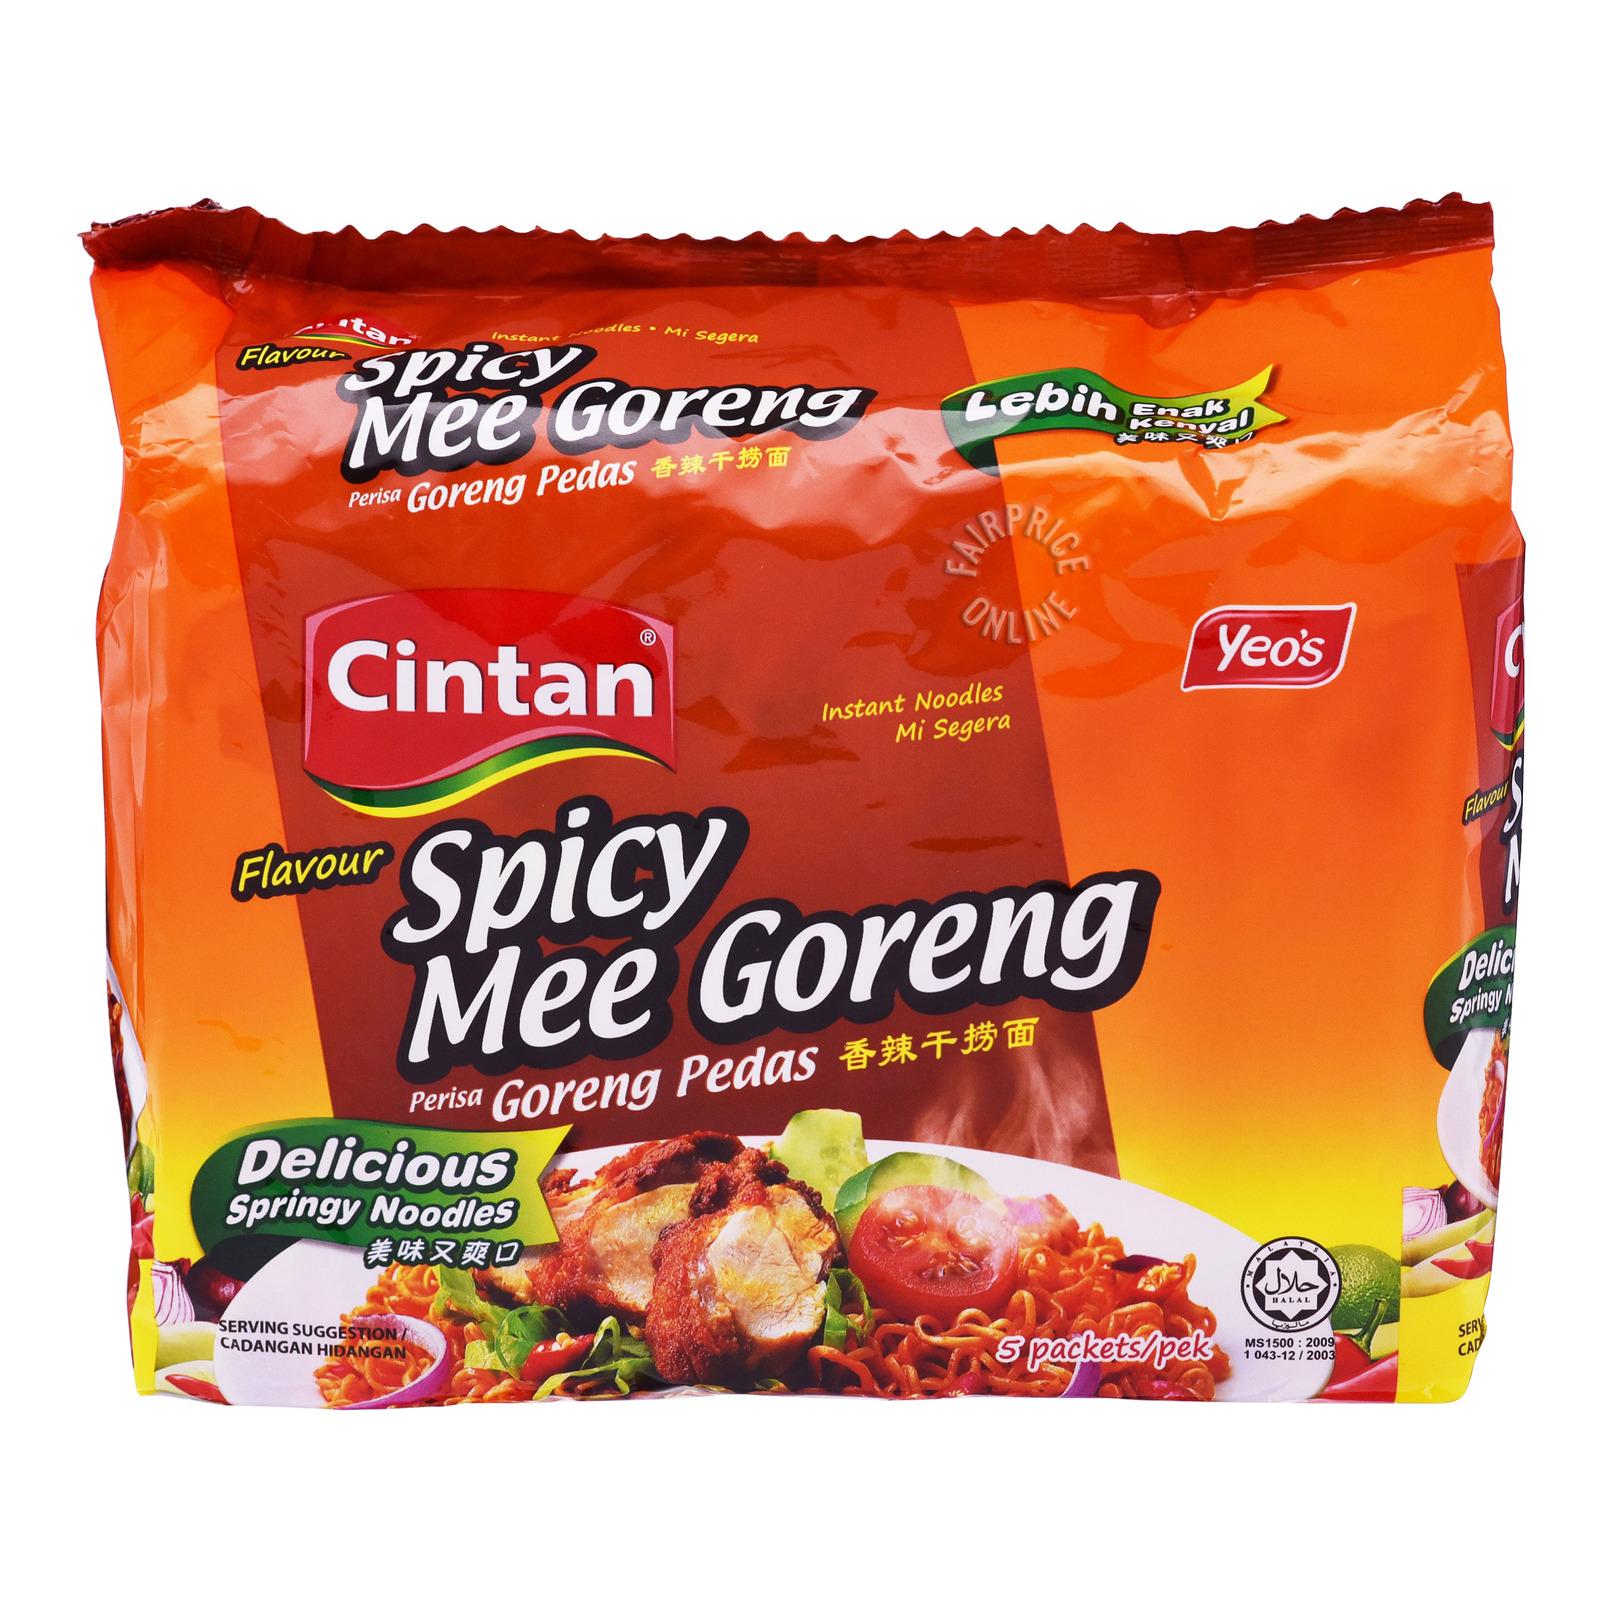 Cintan Instant Noodles - Mi Goreng Spicy